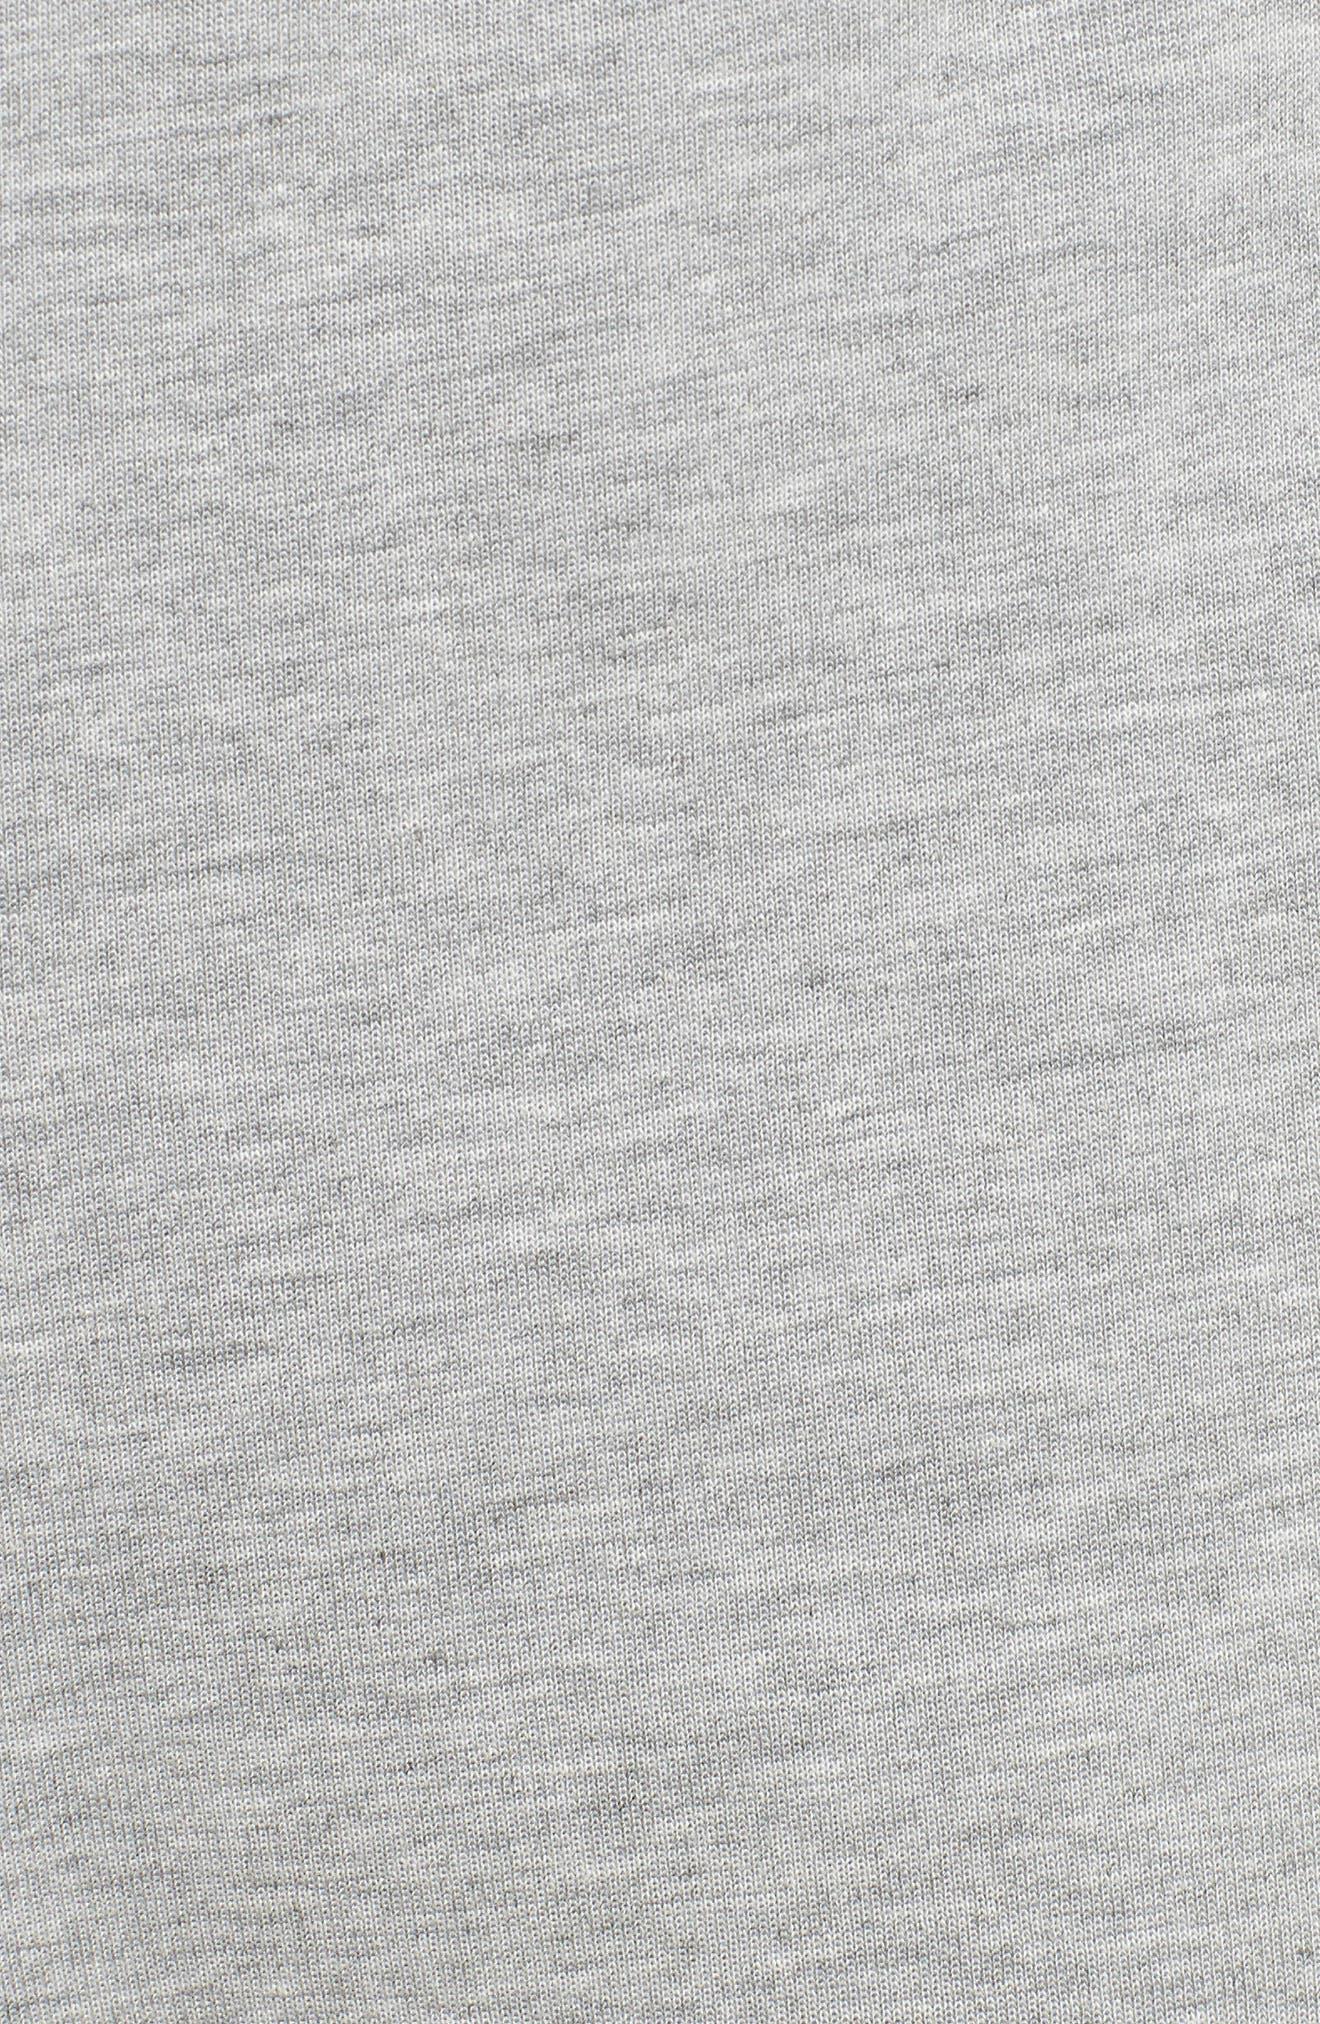 Tech Fleece Jogger Pants,                             Alternate thumbnail 5, color,                             DARK GREY HEATHER/ BLACK